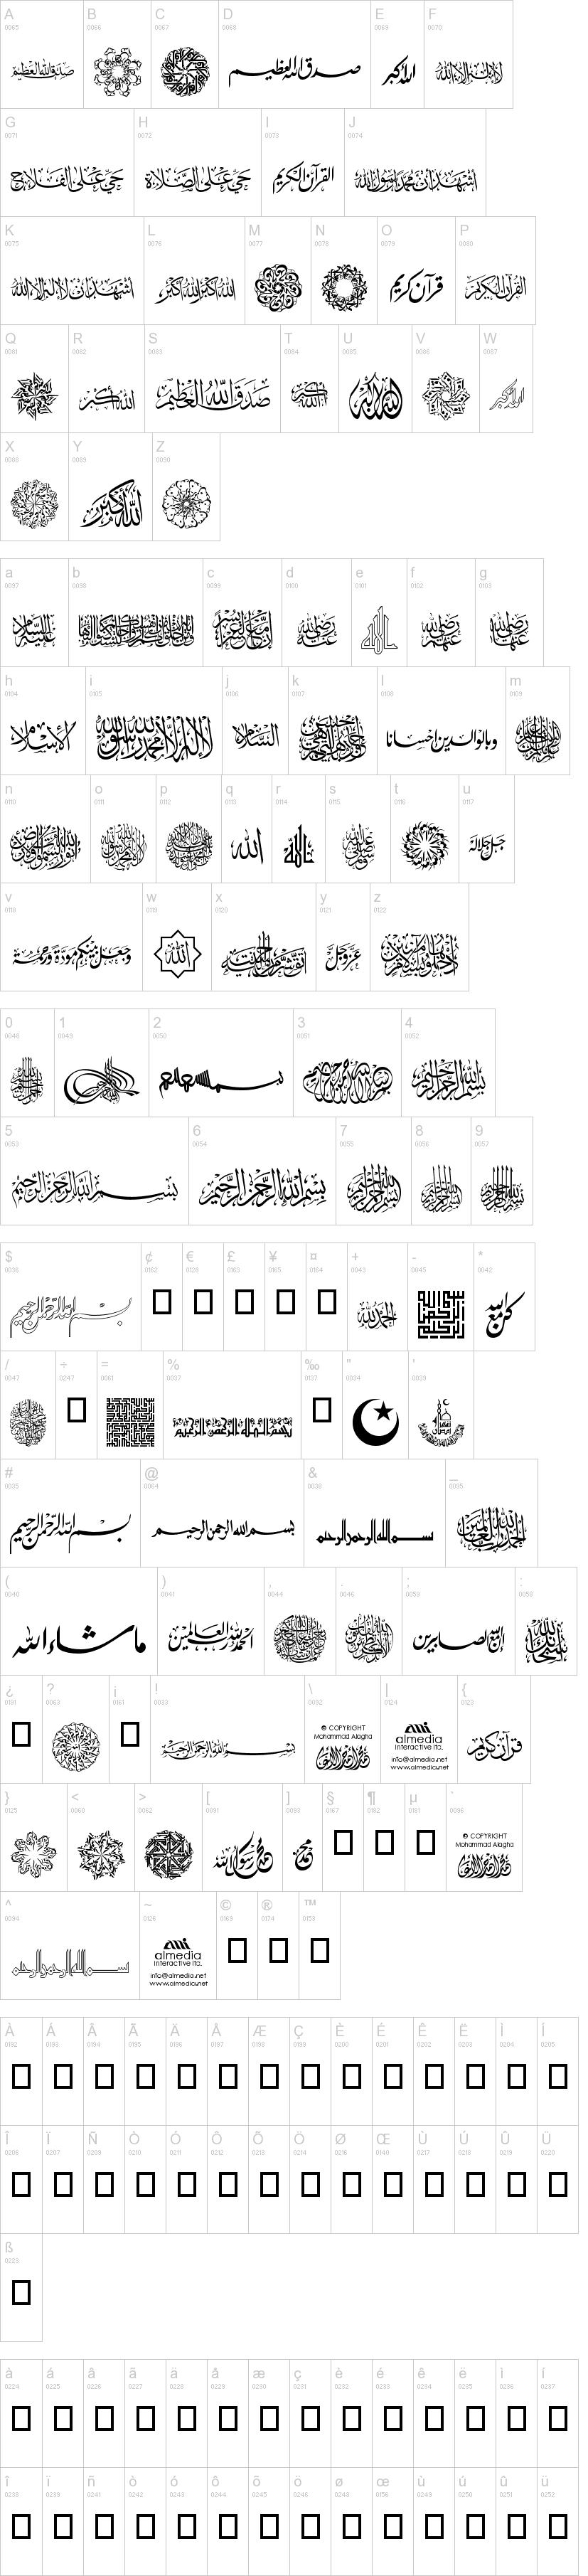 Aga islamic phrases arabic fonts pinterest aga islamic phrases m4hsunfo